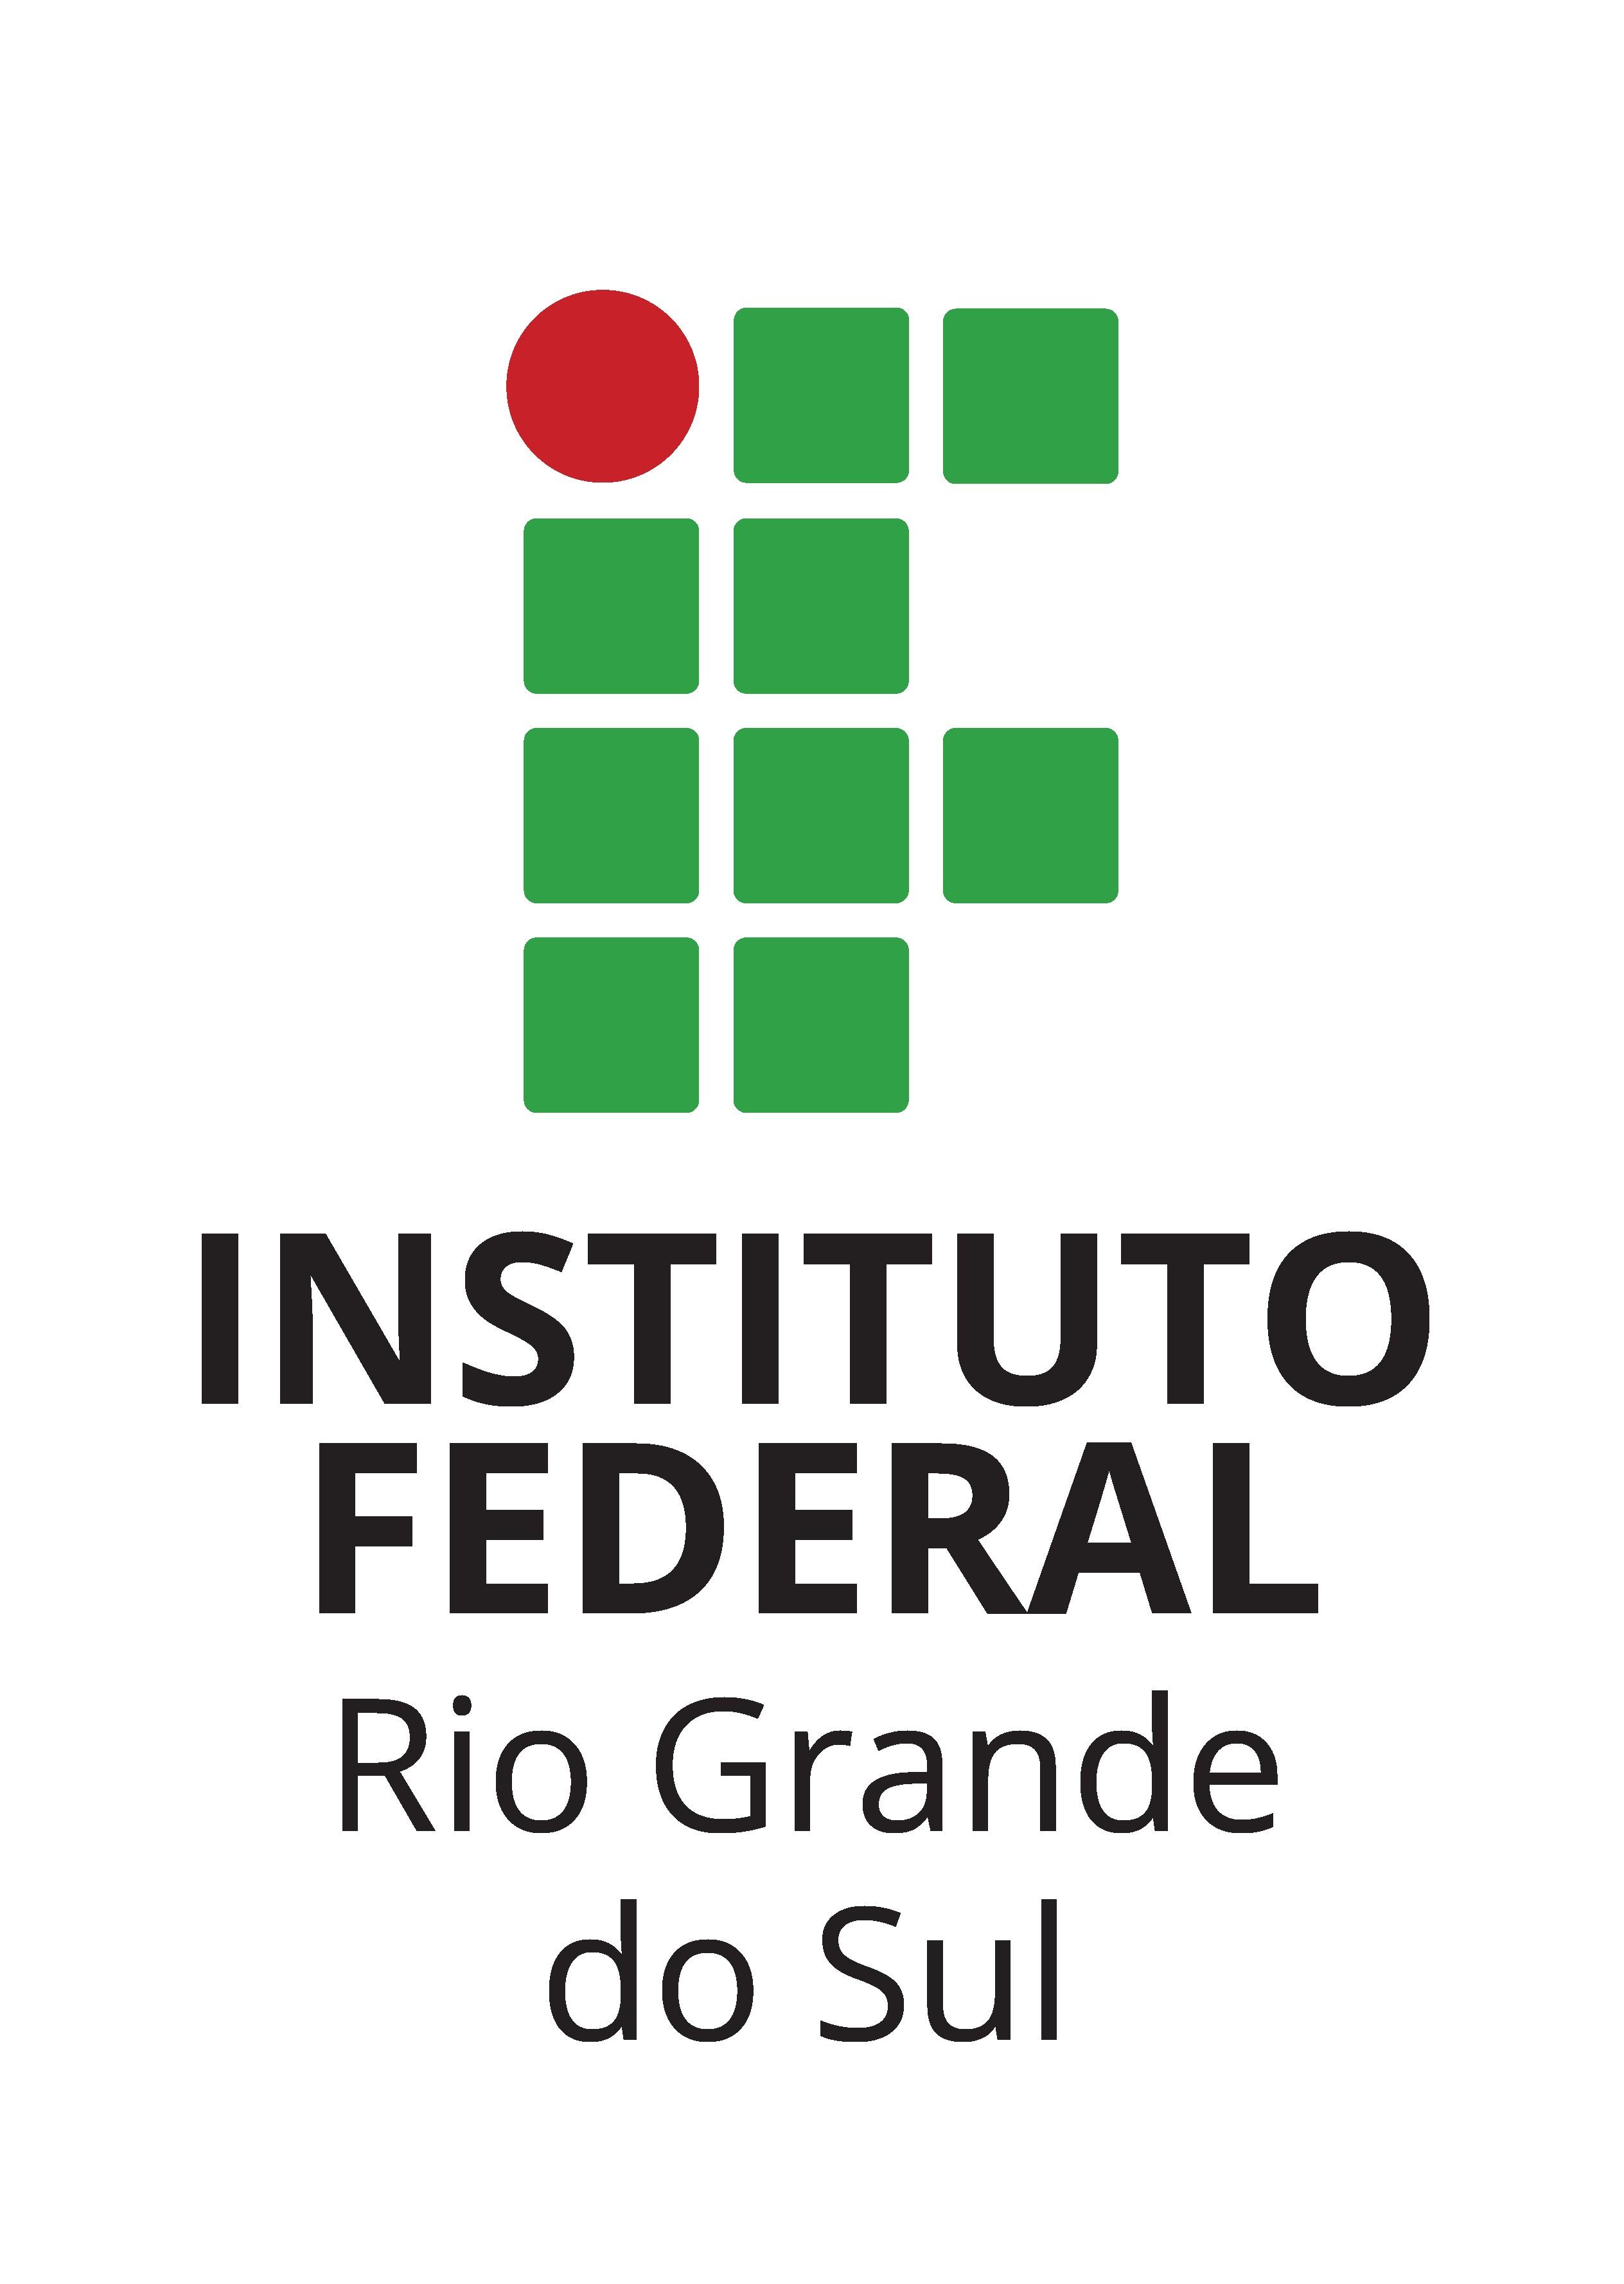 logo vertical